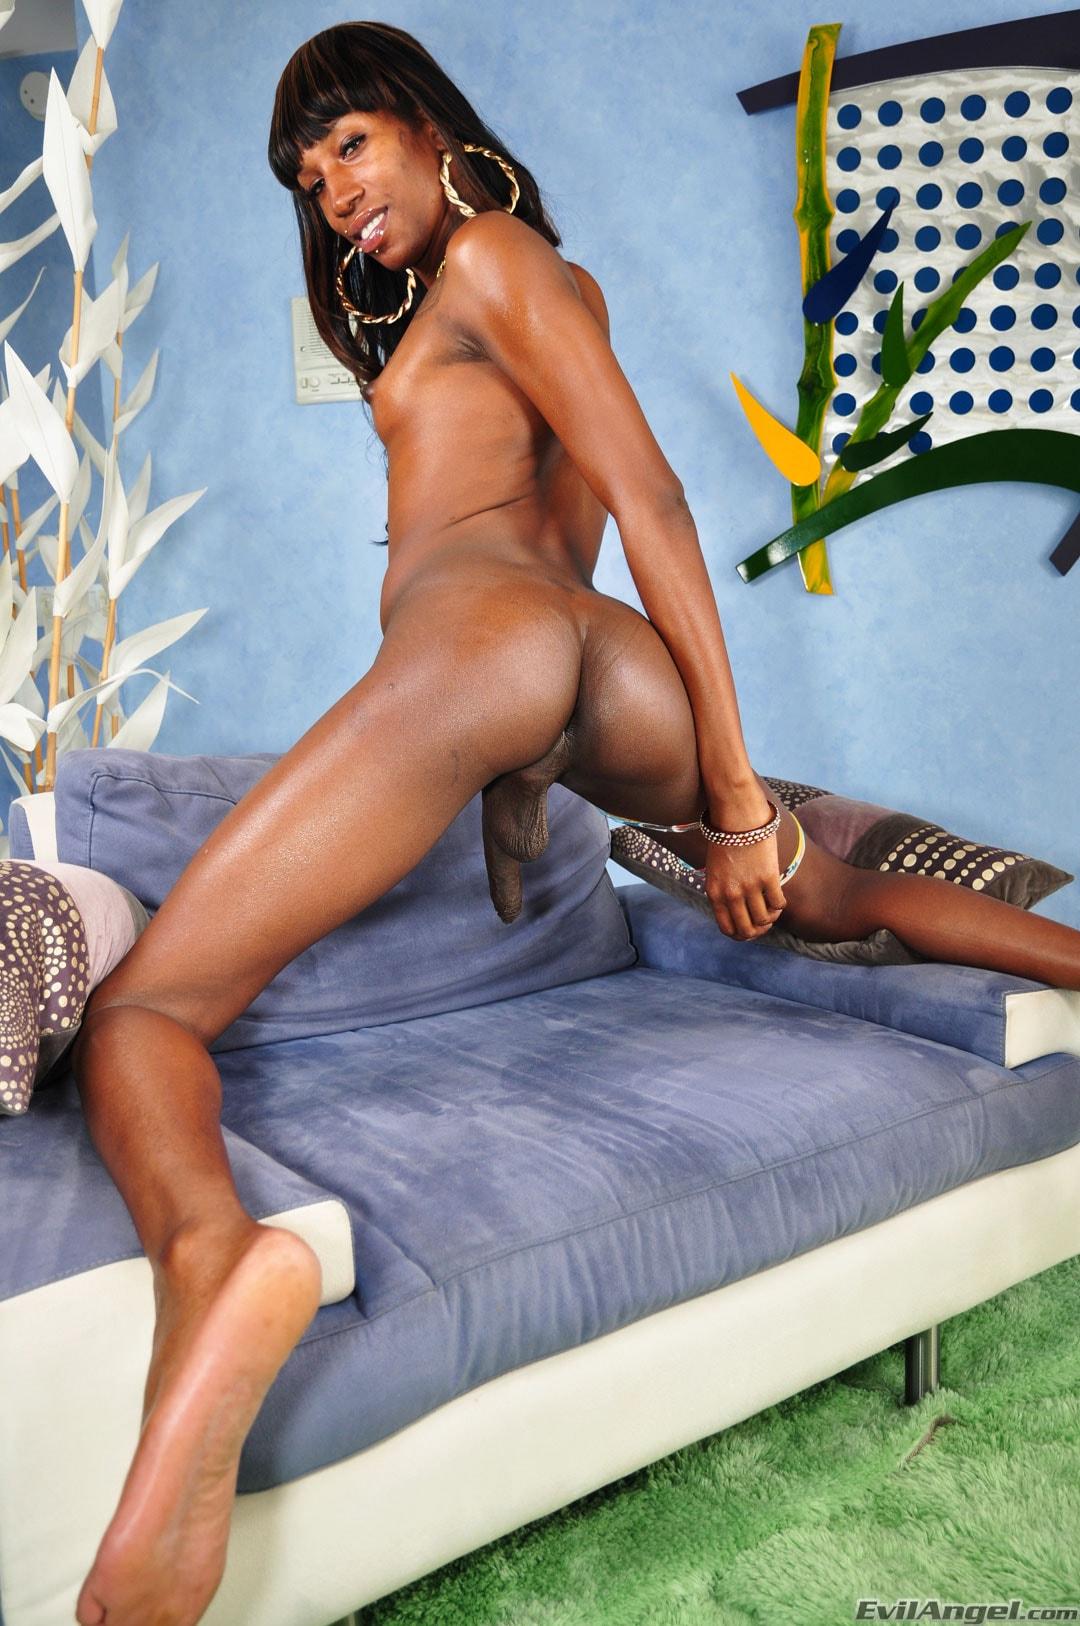 I Love Black Shemales 'Black Shemale Idol - The Auditions' starring Tameka (Photo 14)